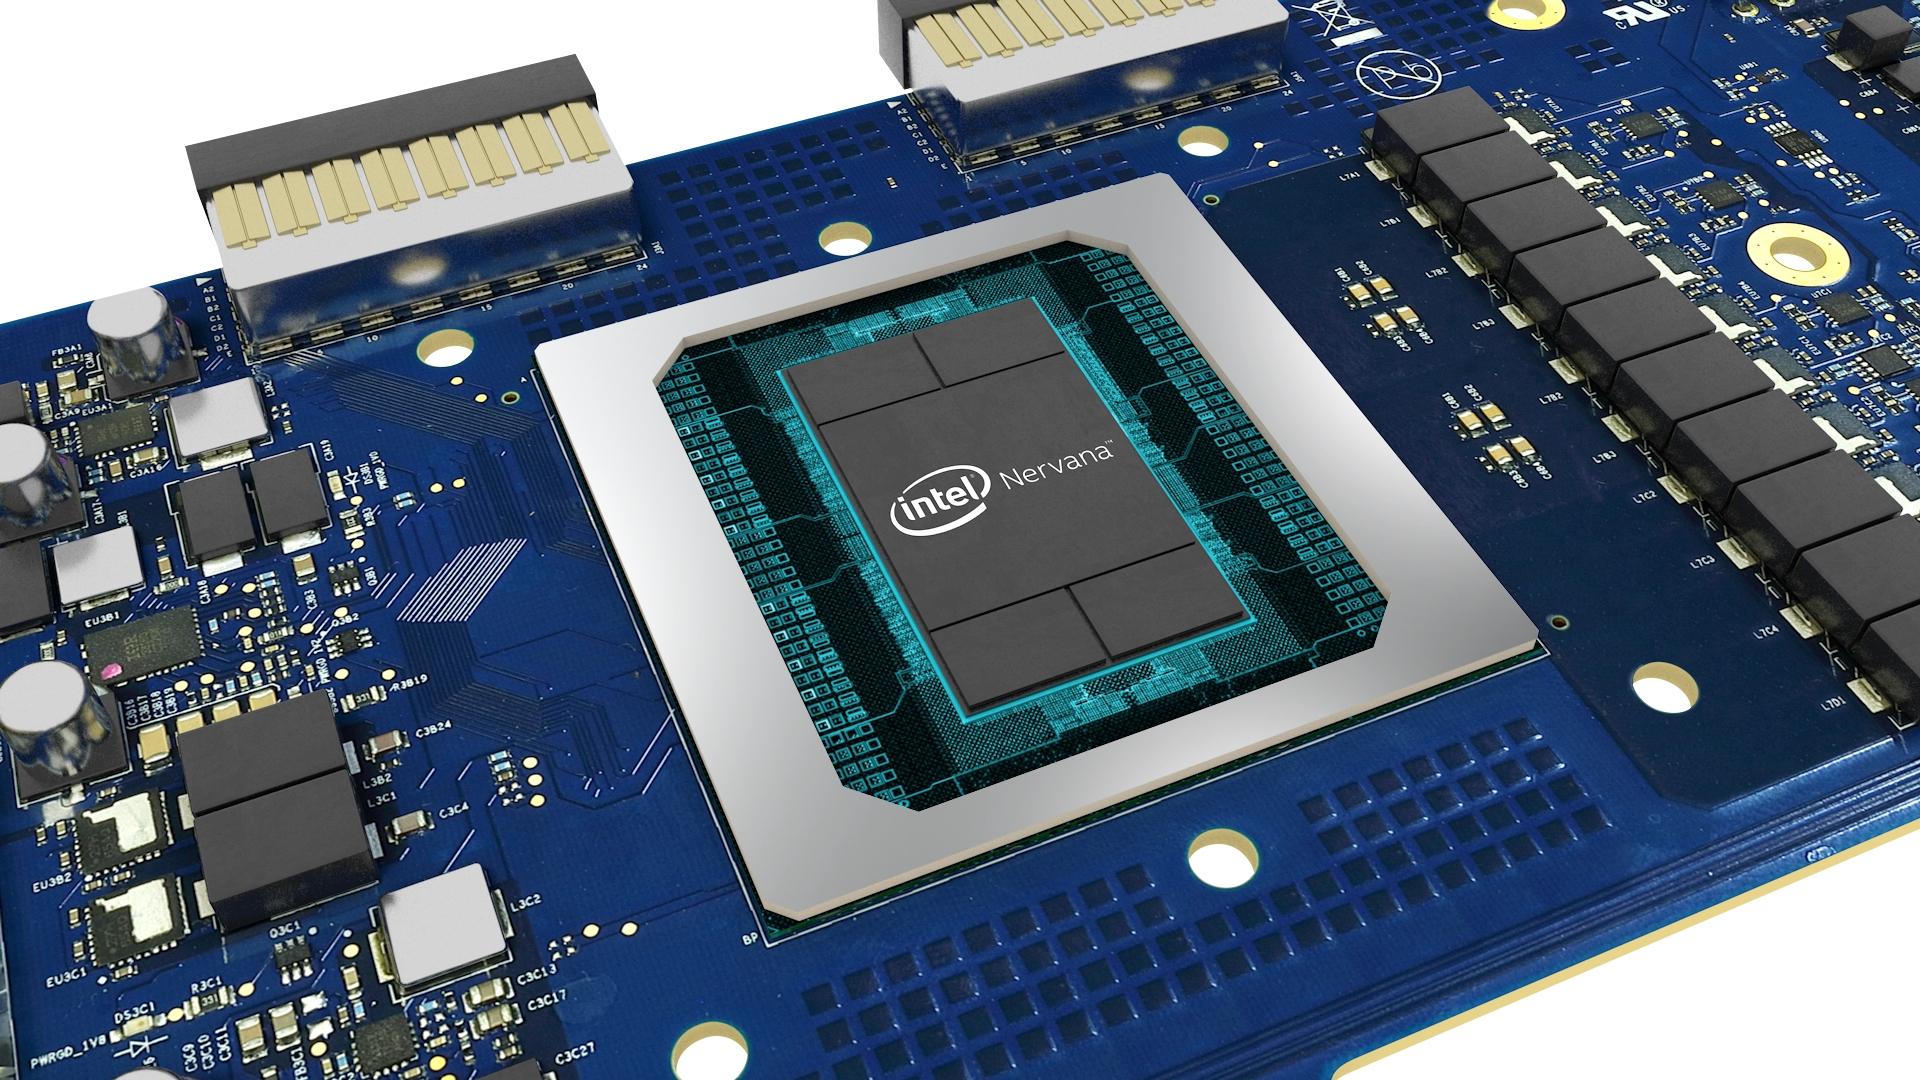 A circuit board featuring a Intel Nervana processor.